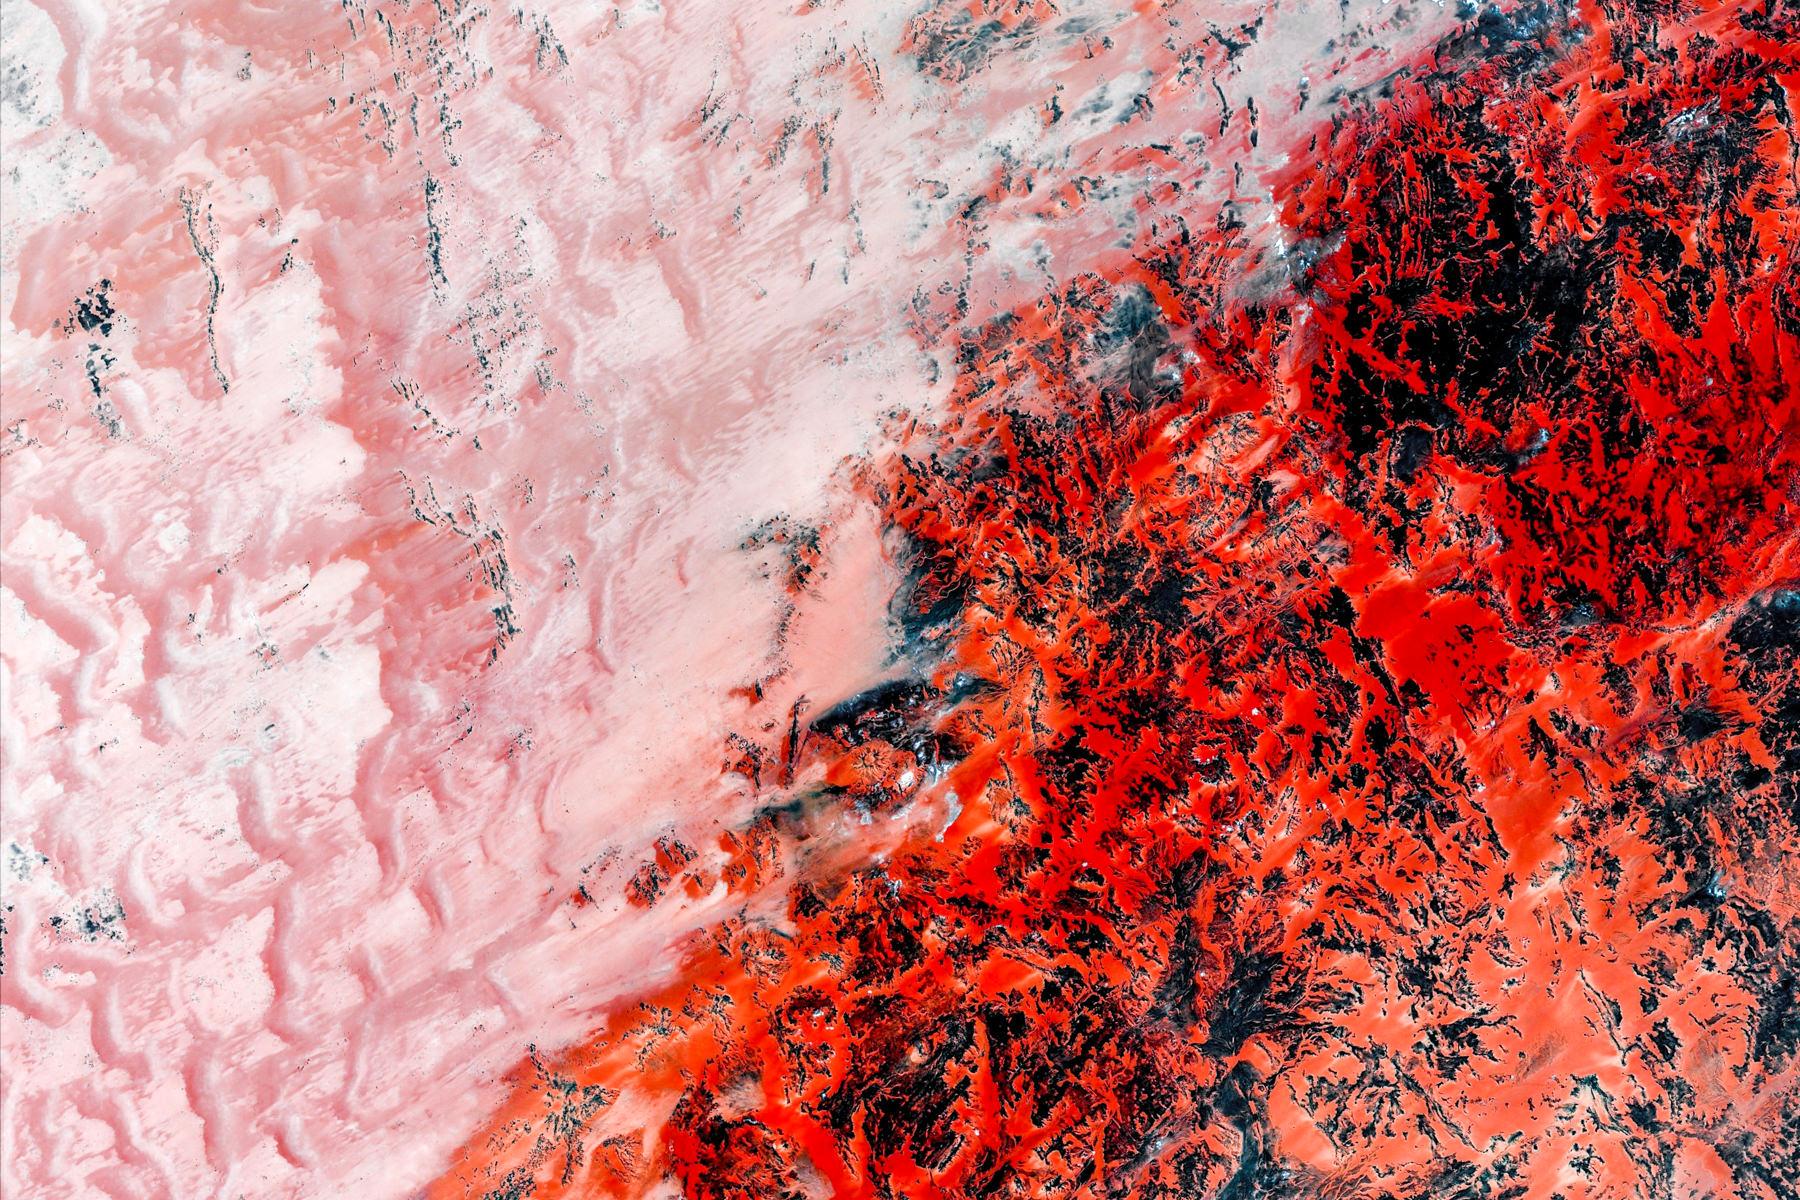 google-earth-Sudan-Mellit-12658